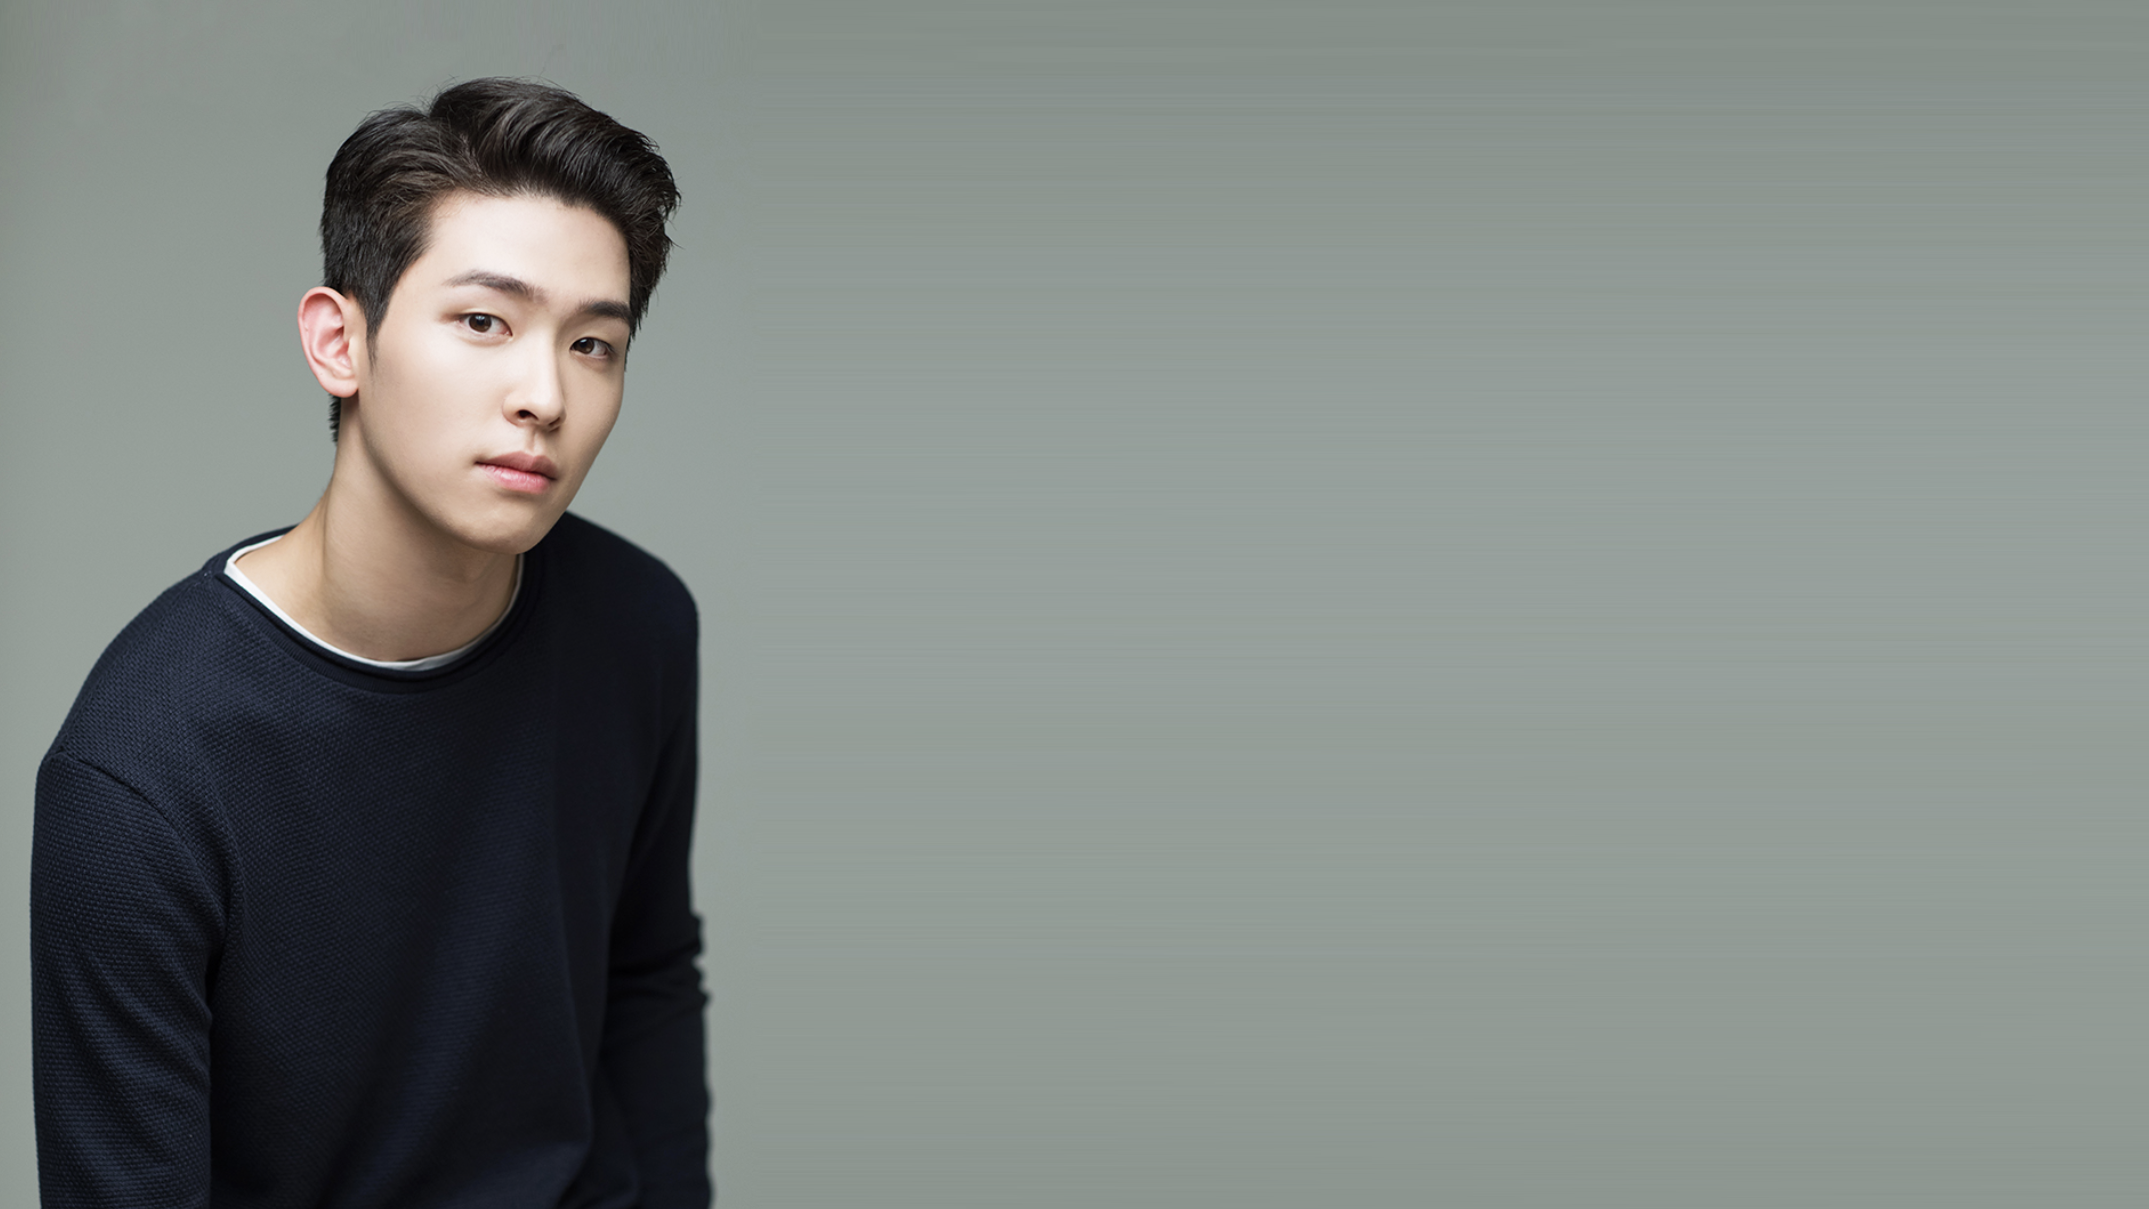 Lee Chan Sun